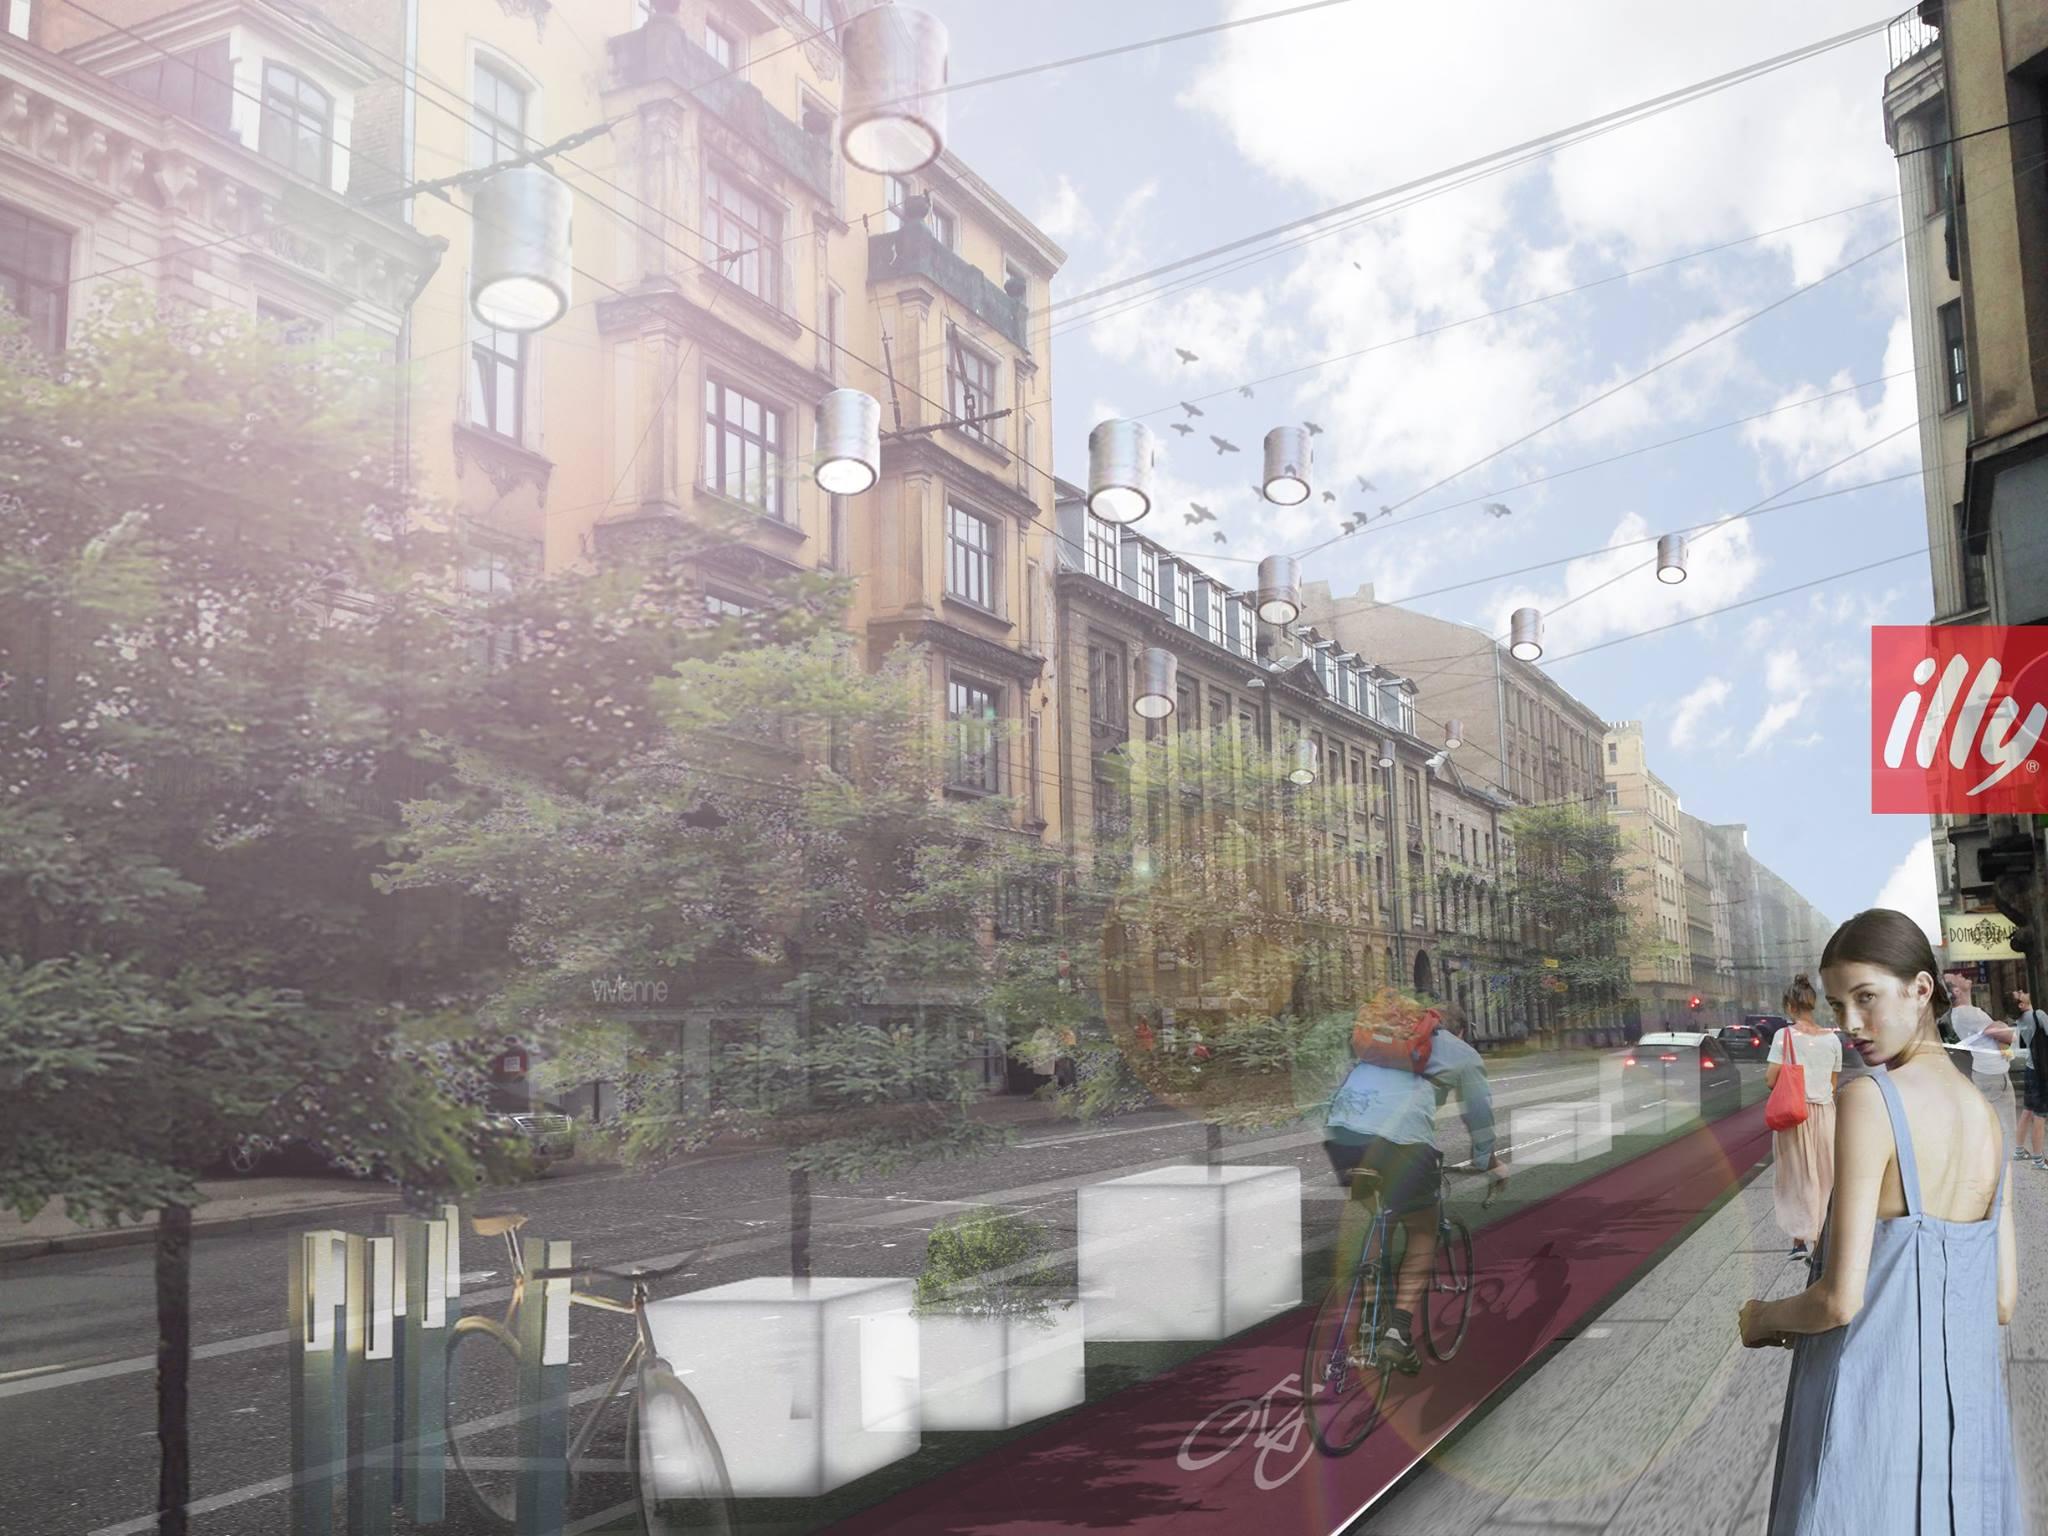 ДНЕМ Такой улицу Чака видят архитекторы М. Кулитане и Э. А. Каужена.